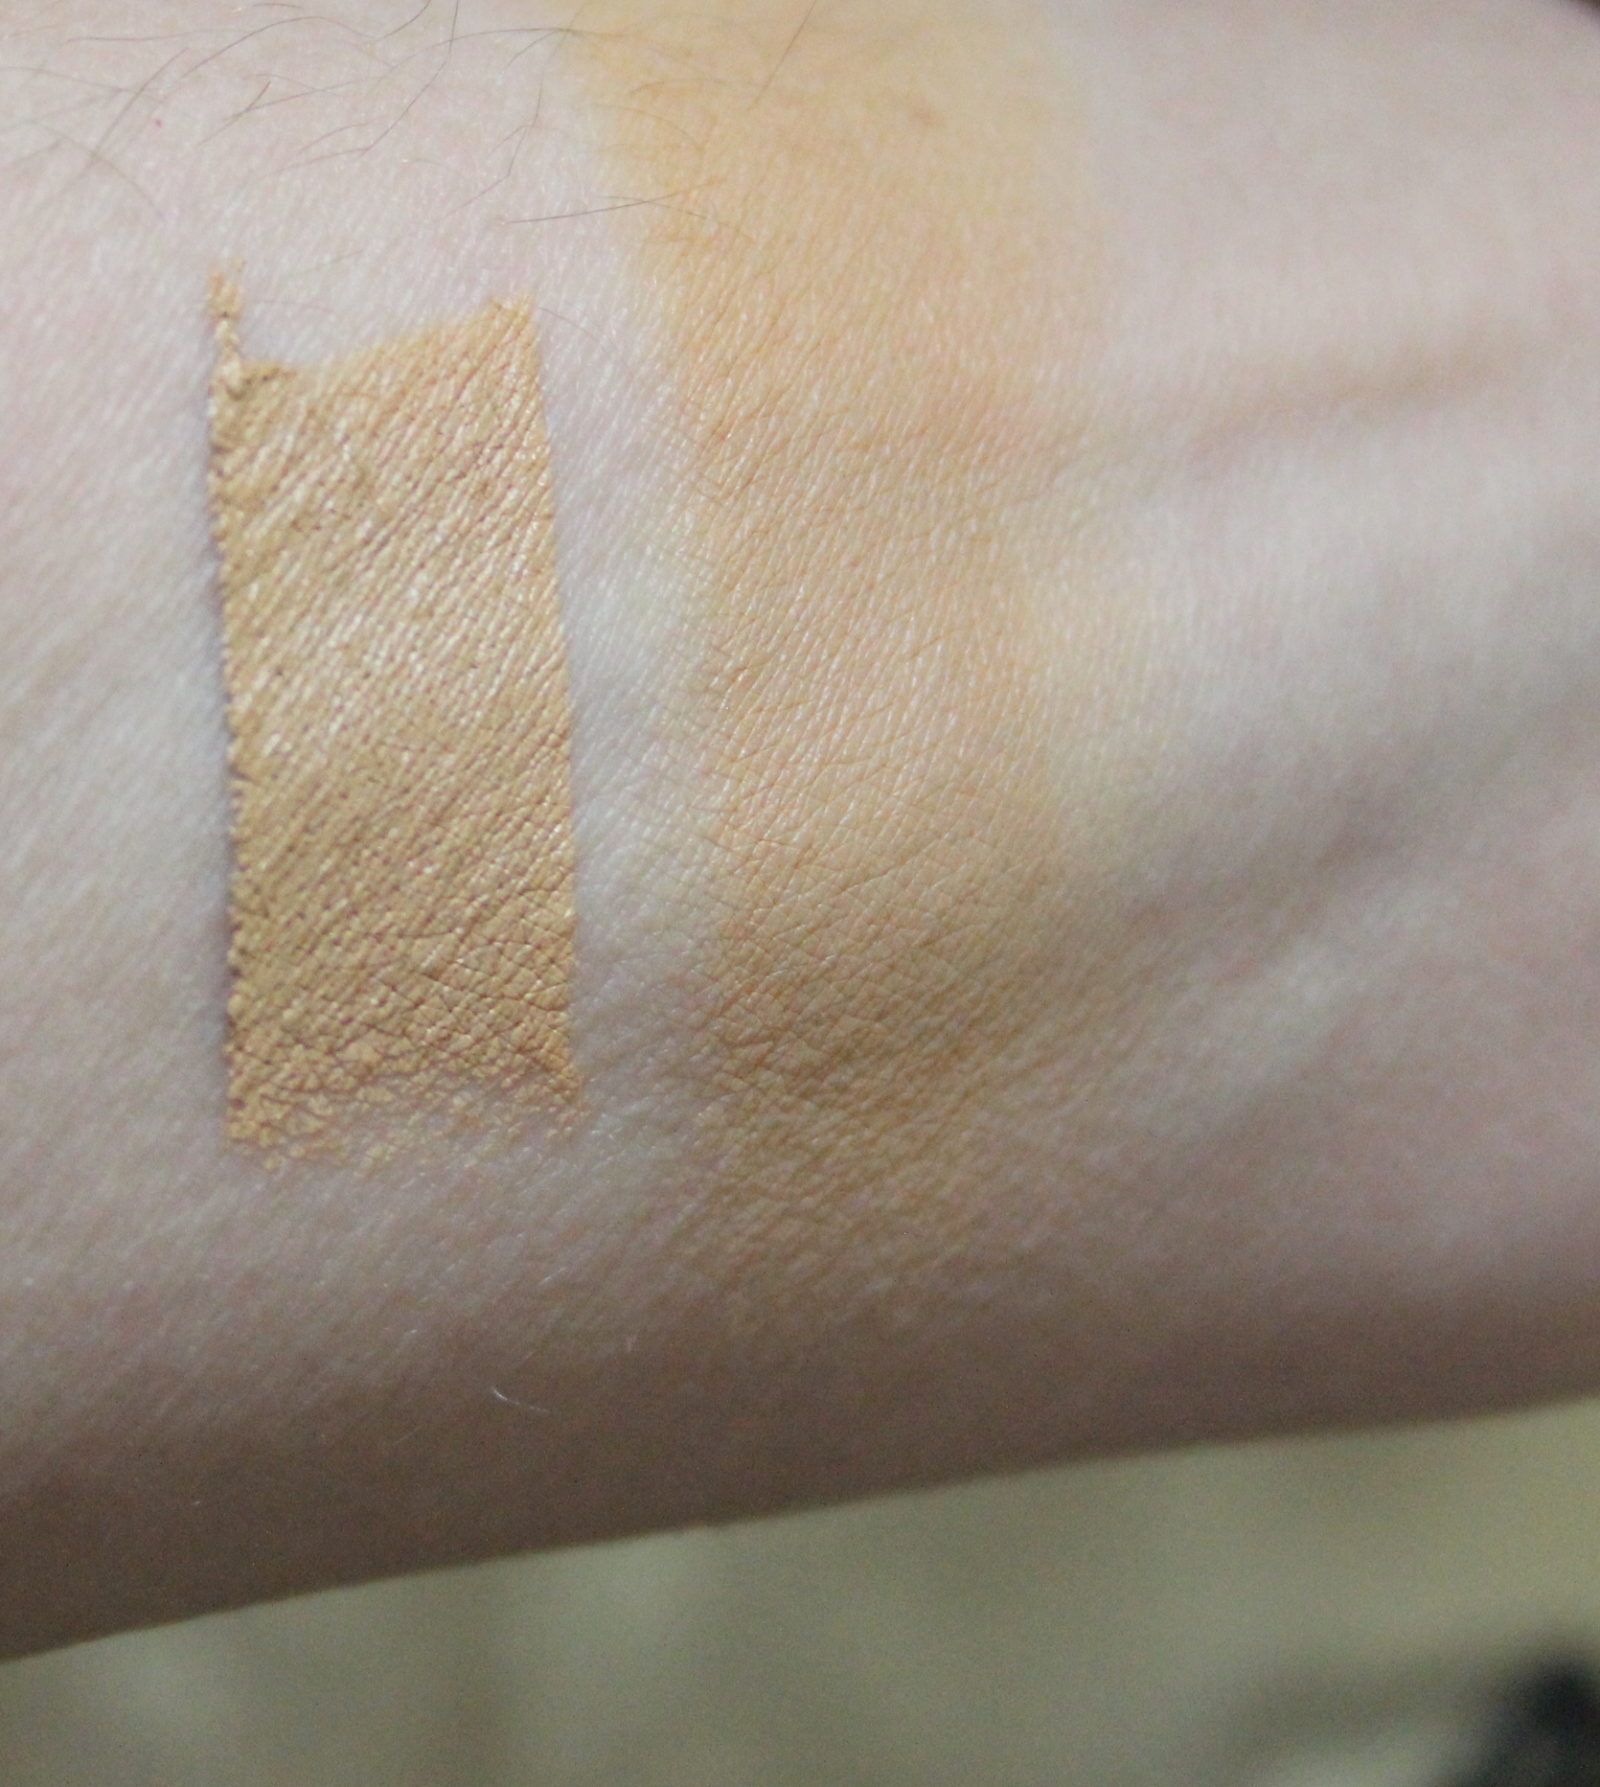 Hourglass Vanish Stick Golden Swatch on Skin